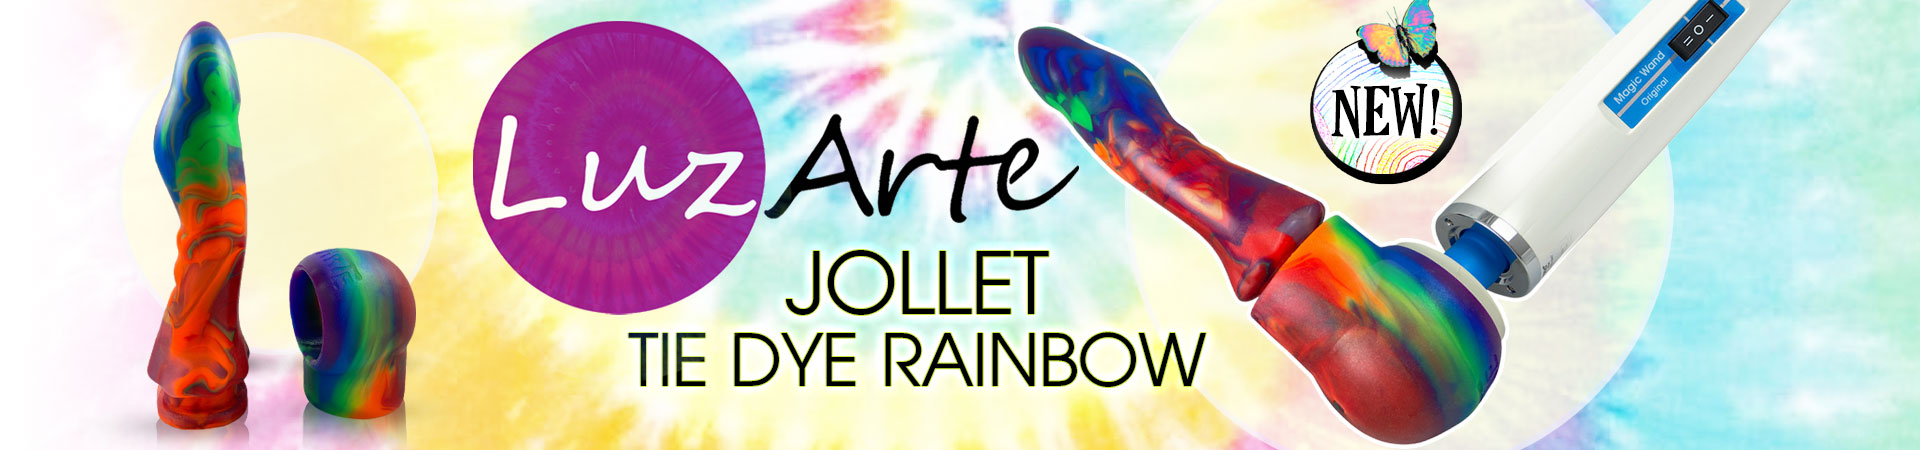 New Luz Arte - Jollet Tie Dye Rainbow!